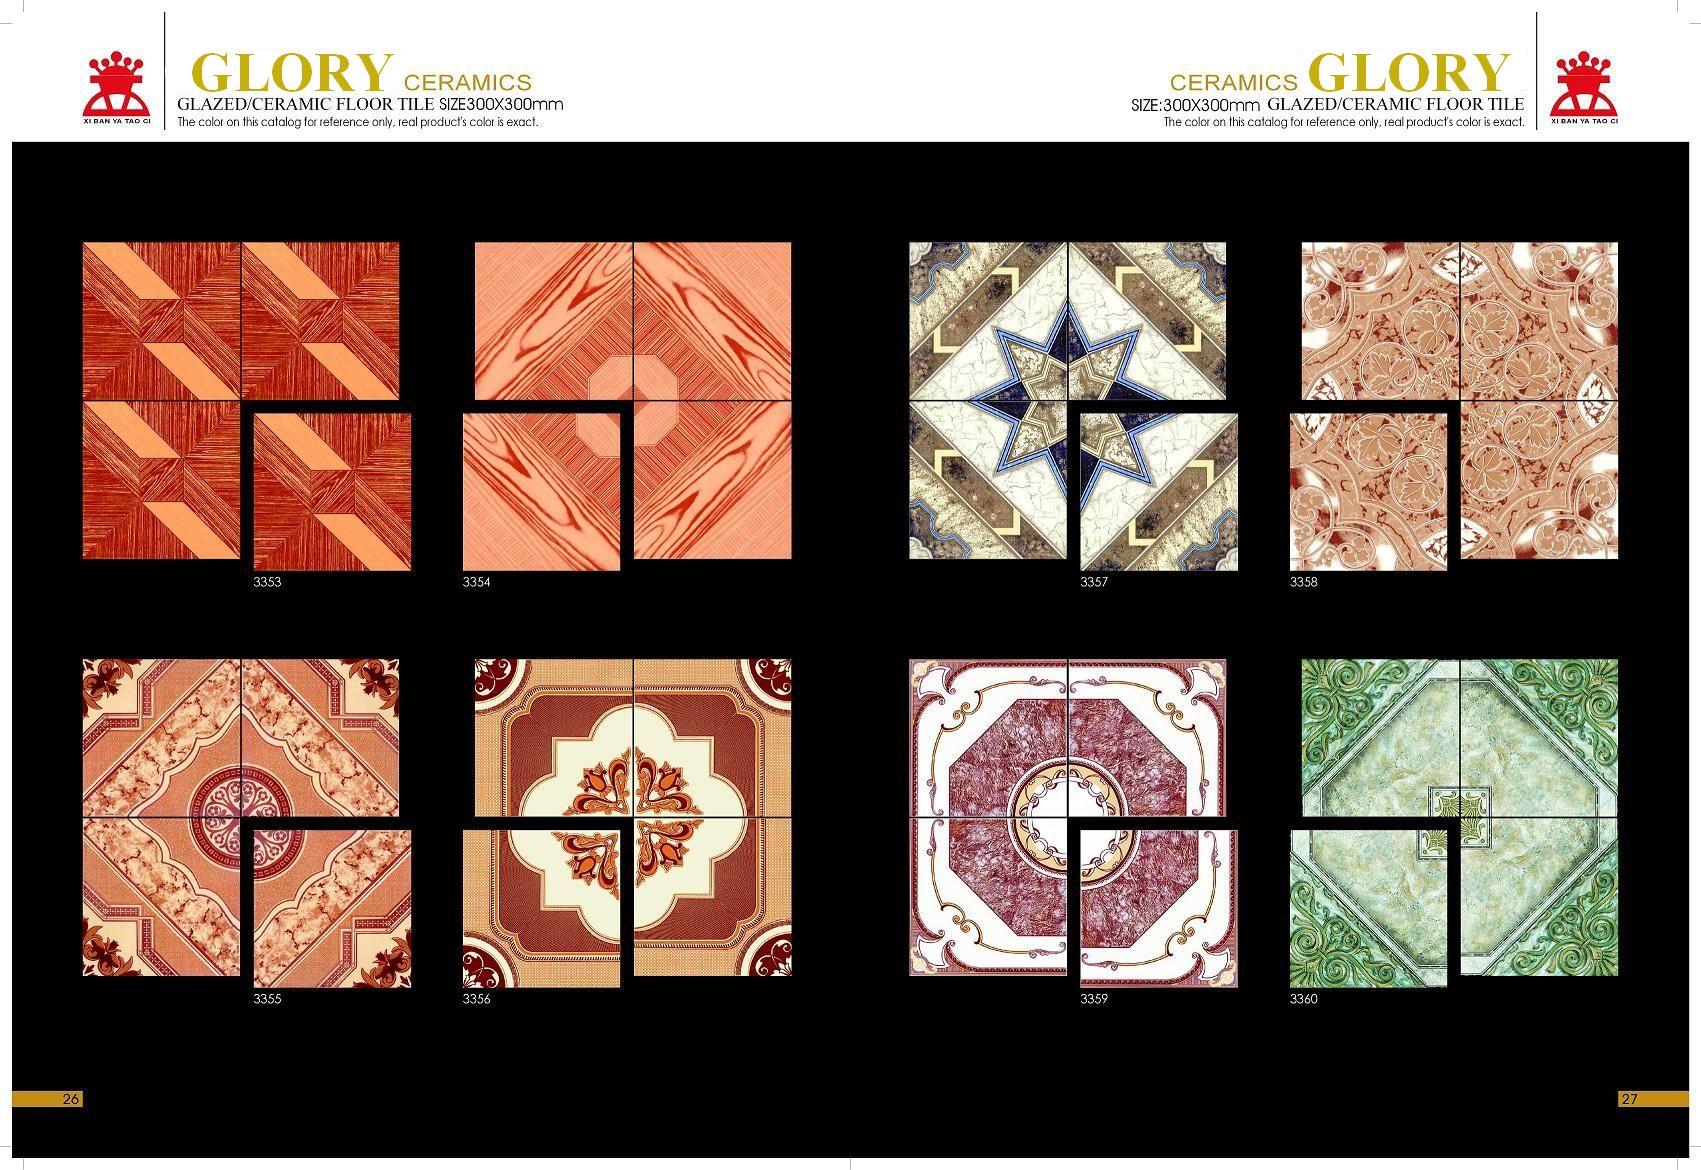 What is glazed ceramic tile